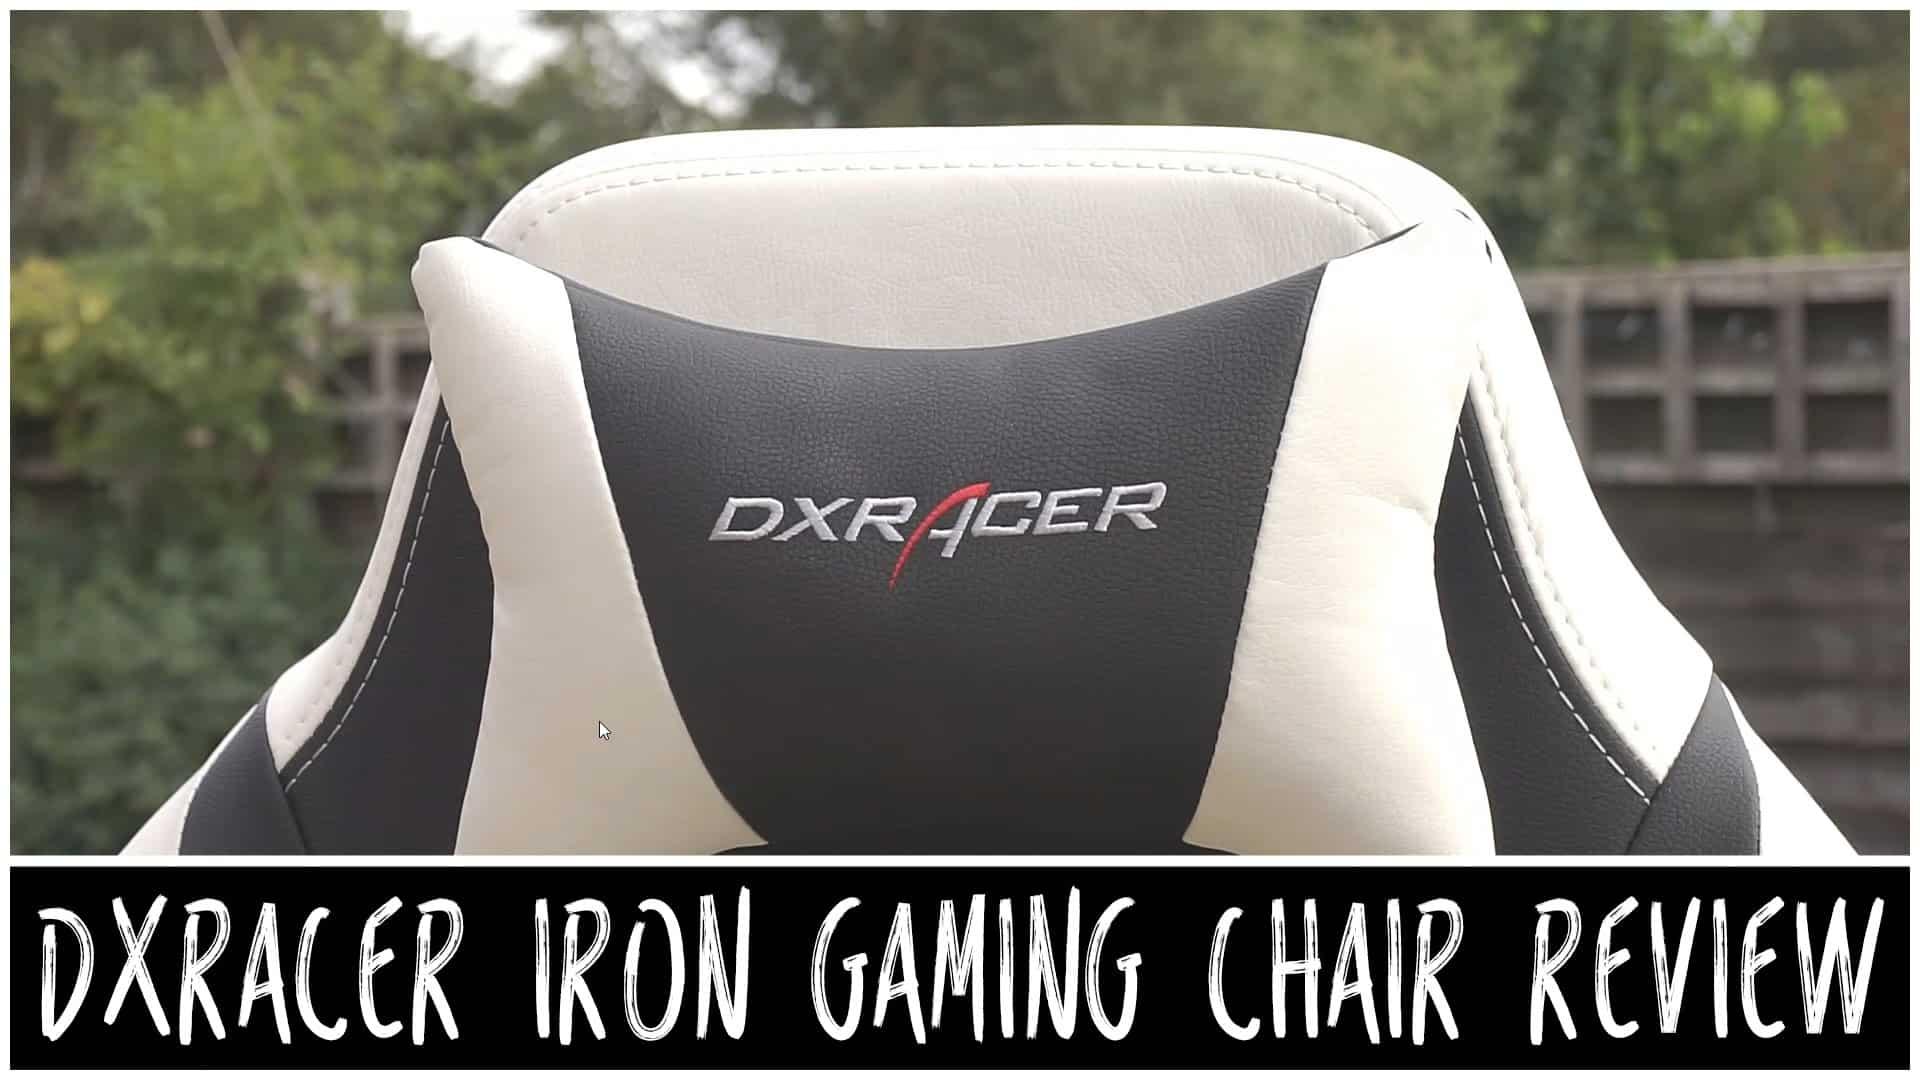 Dxracer iron achat fauteuil gamer dxracer iron series for Chaise gamer pas cher